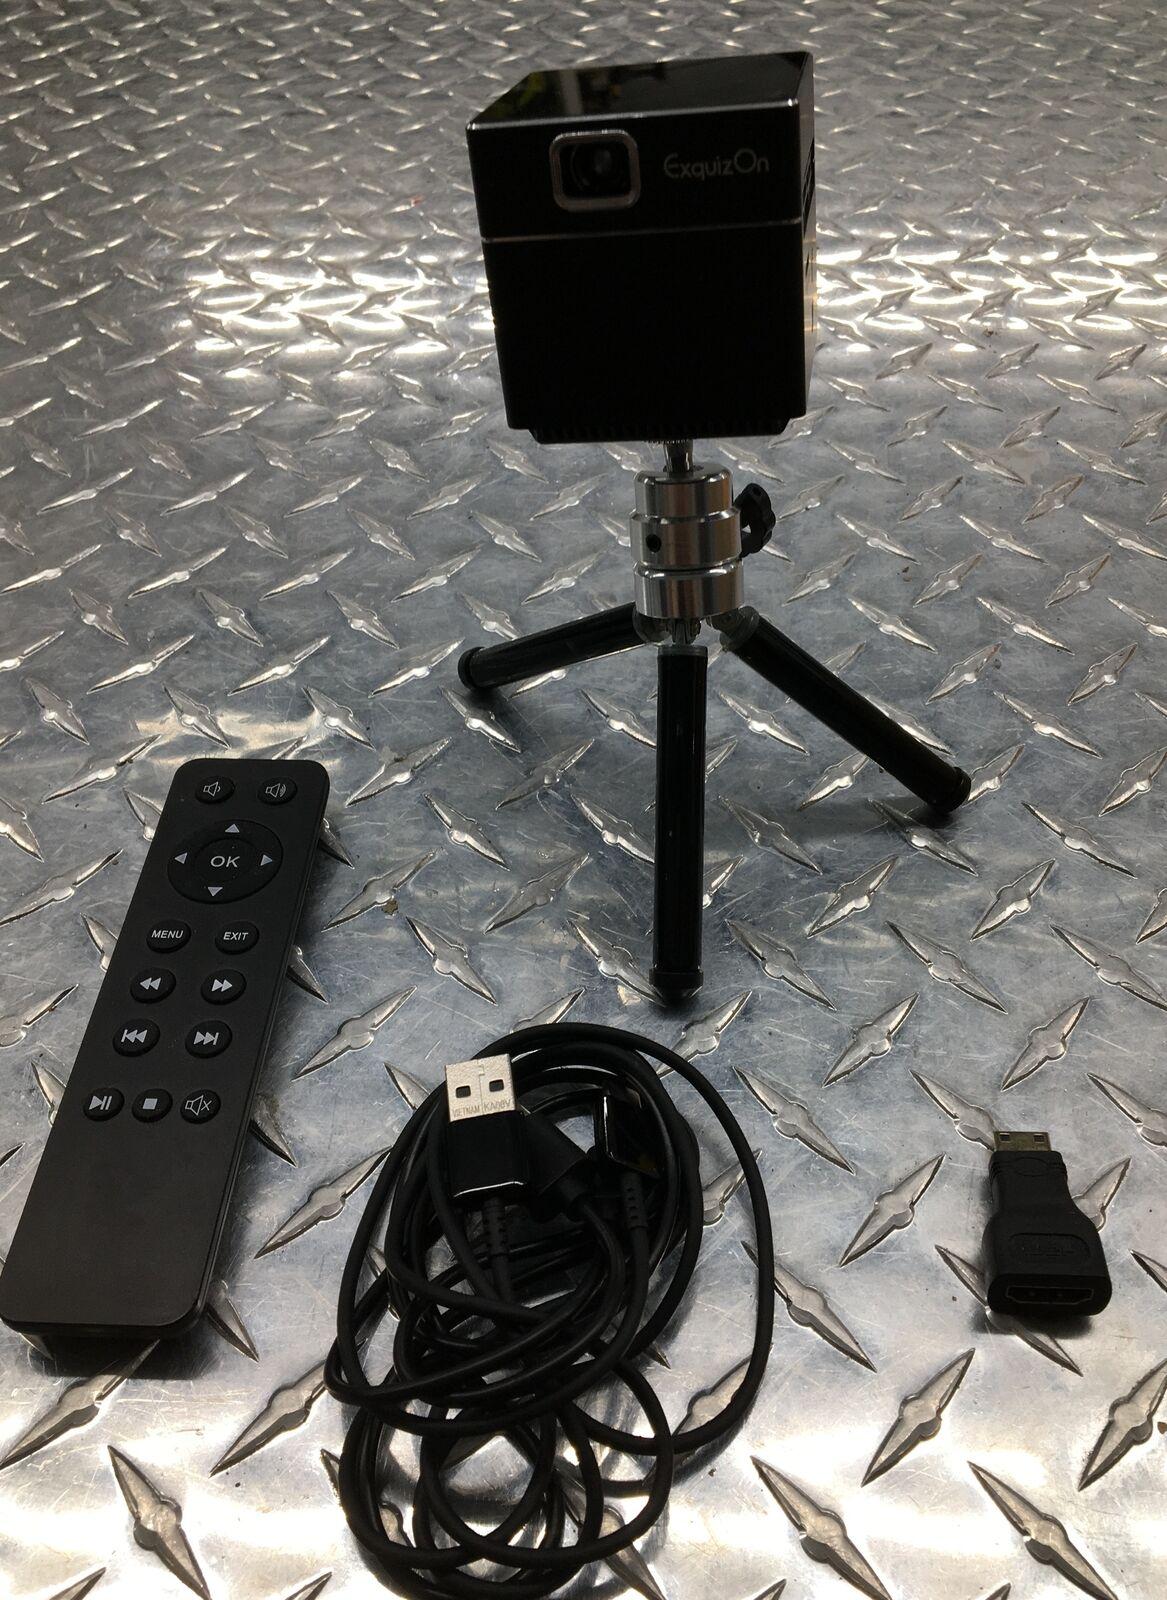 orimag p6 mini dlp projector aluminum body 1080p support 80 ansi lumen for sale online ebay ebay